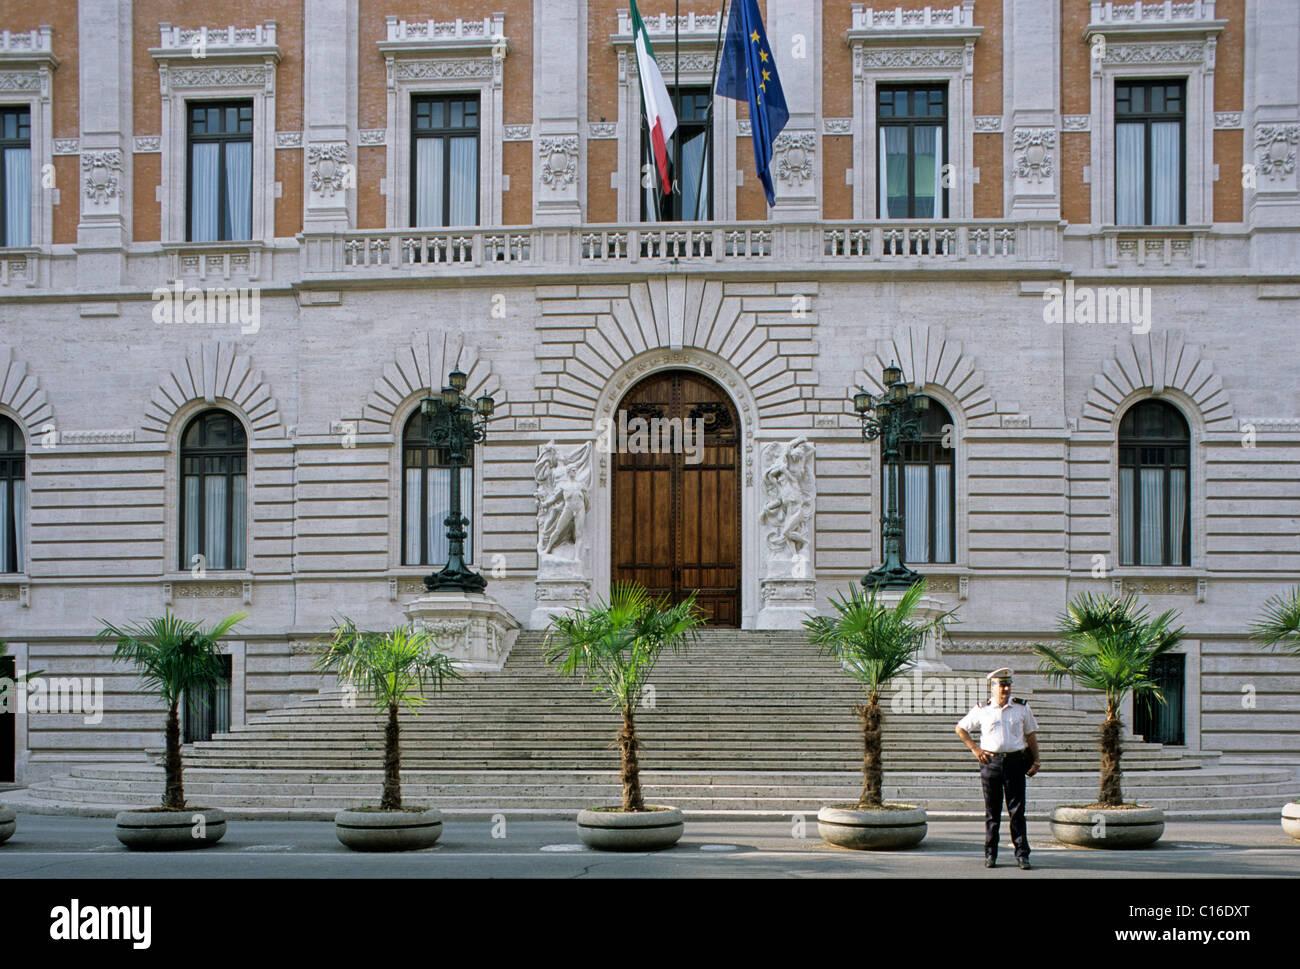 Montecitorio stock photos montecitorio stock images alamy for Parlamento montecitorio